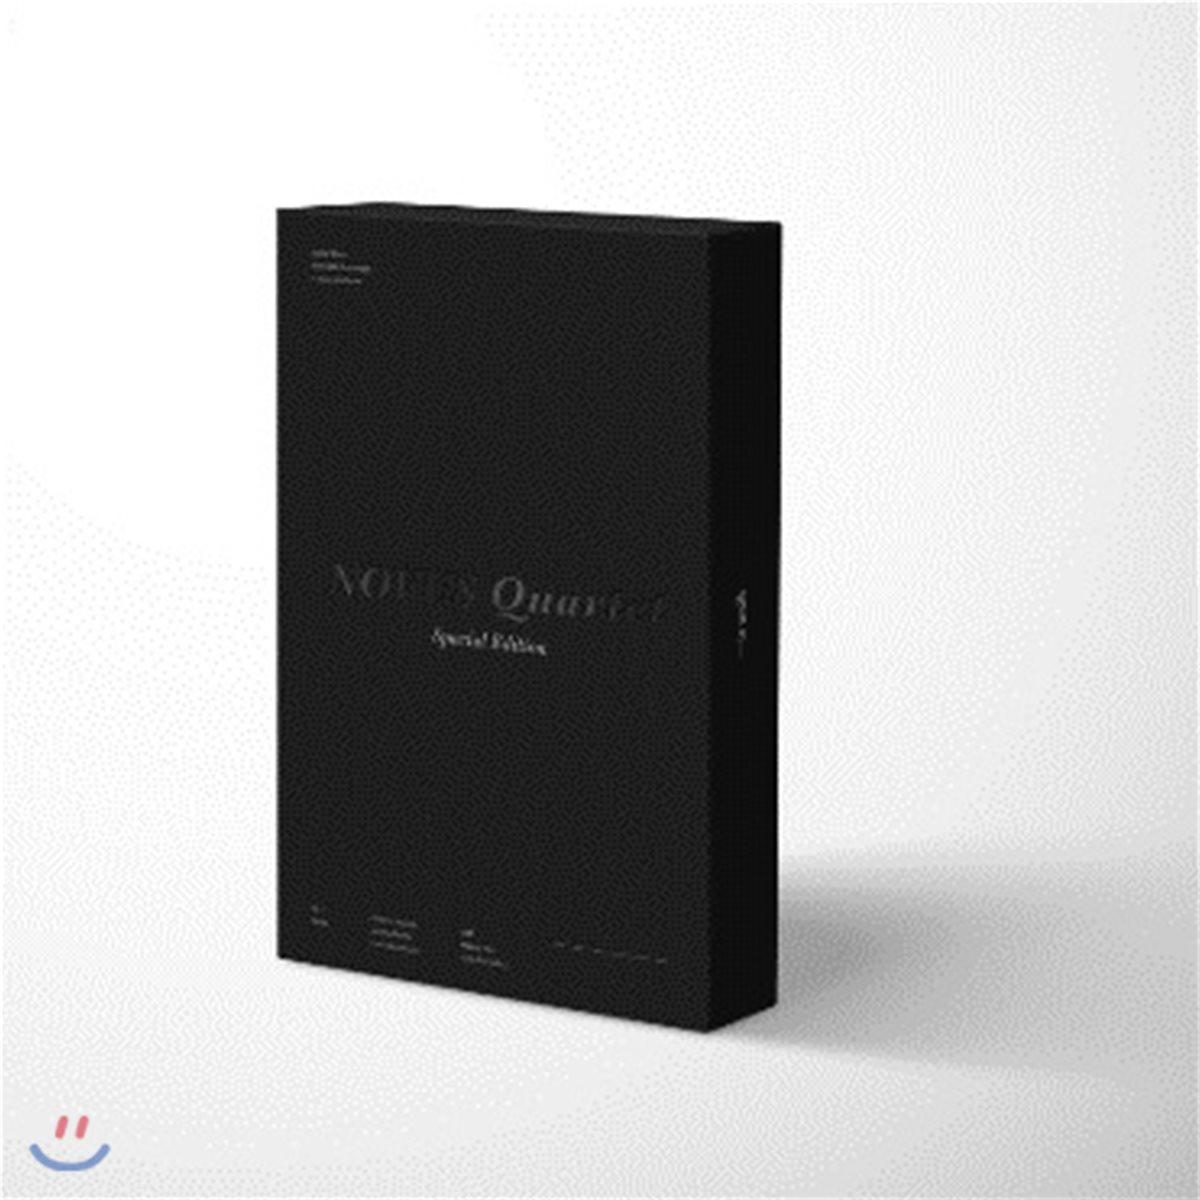 Novus Quartet 노부스 콰르텟 예술의전당 30주년 기념 스페셜 앨범 (To Walk)